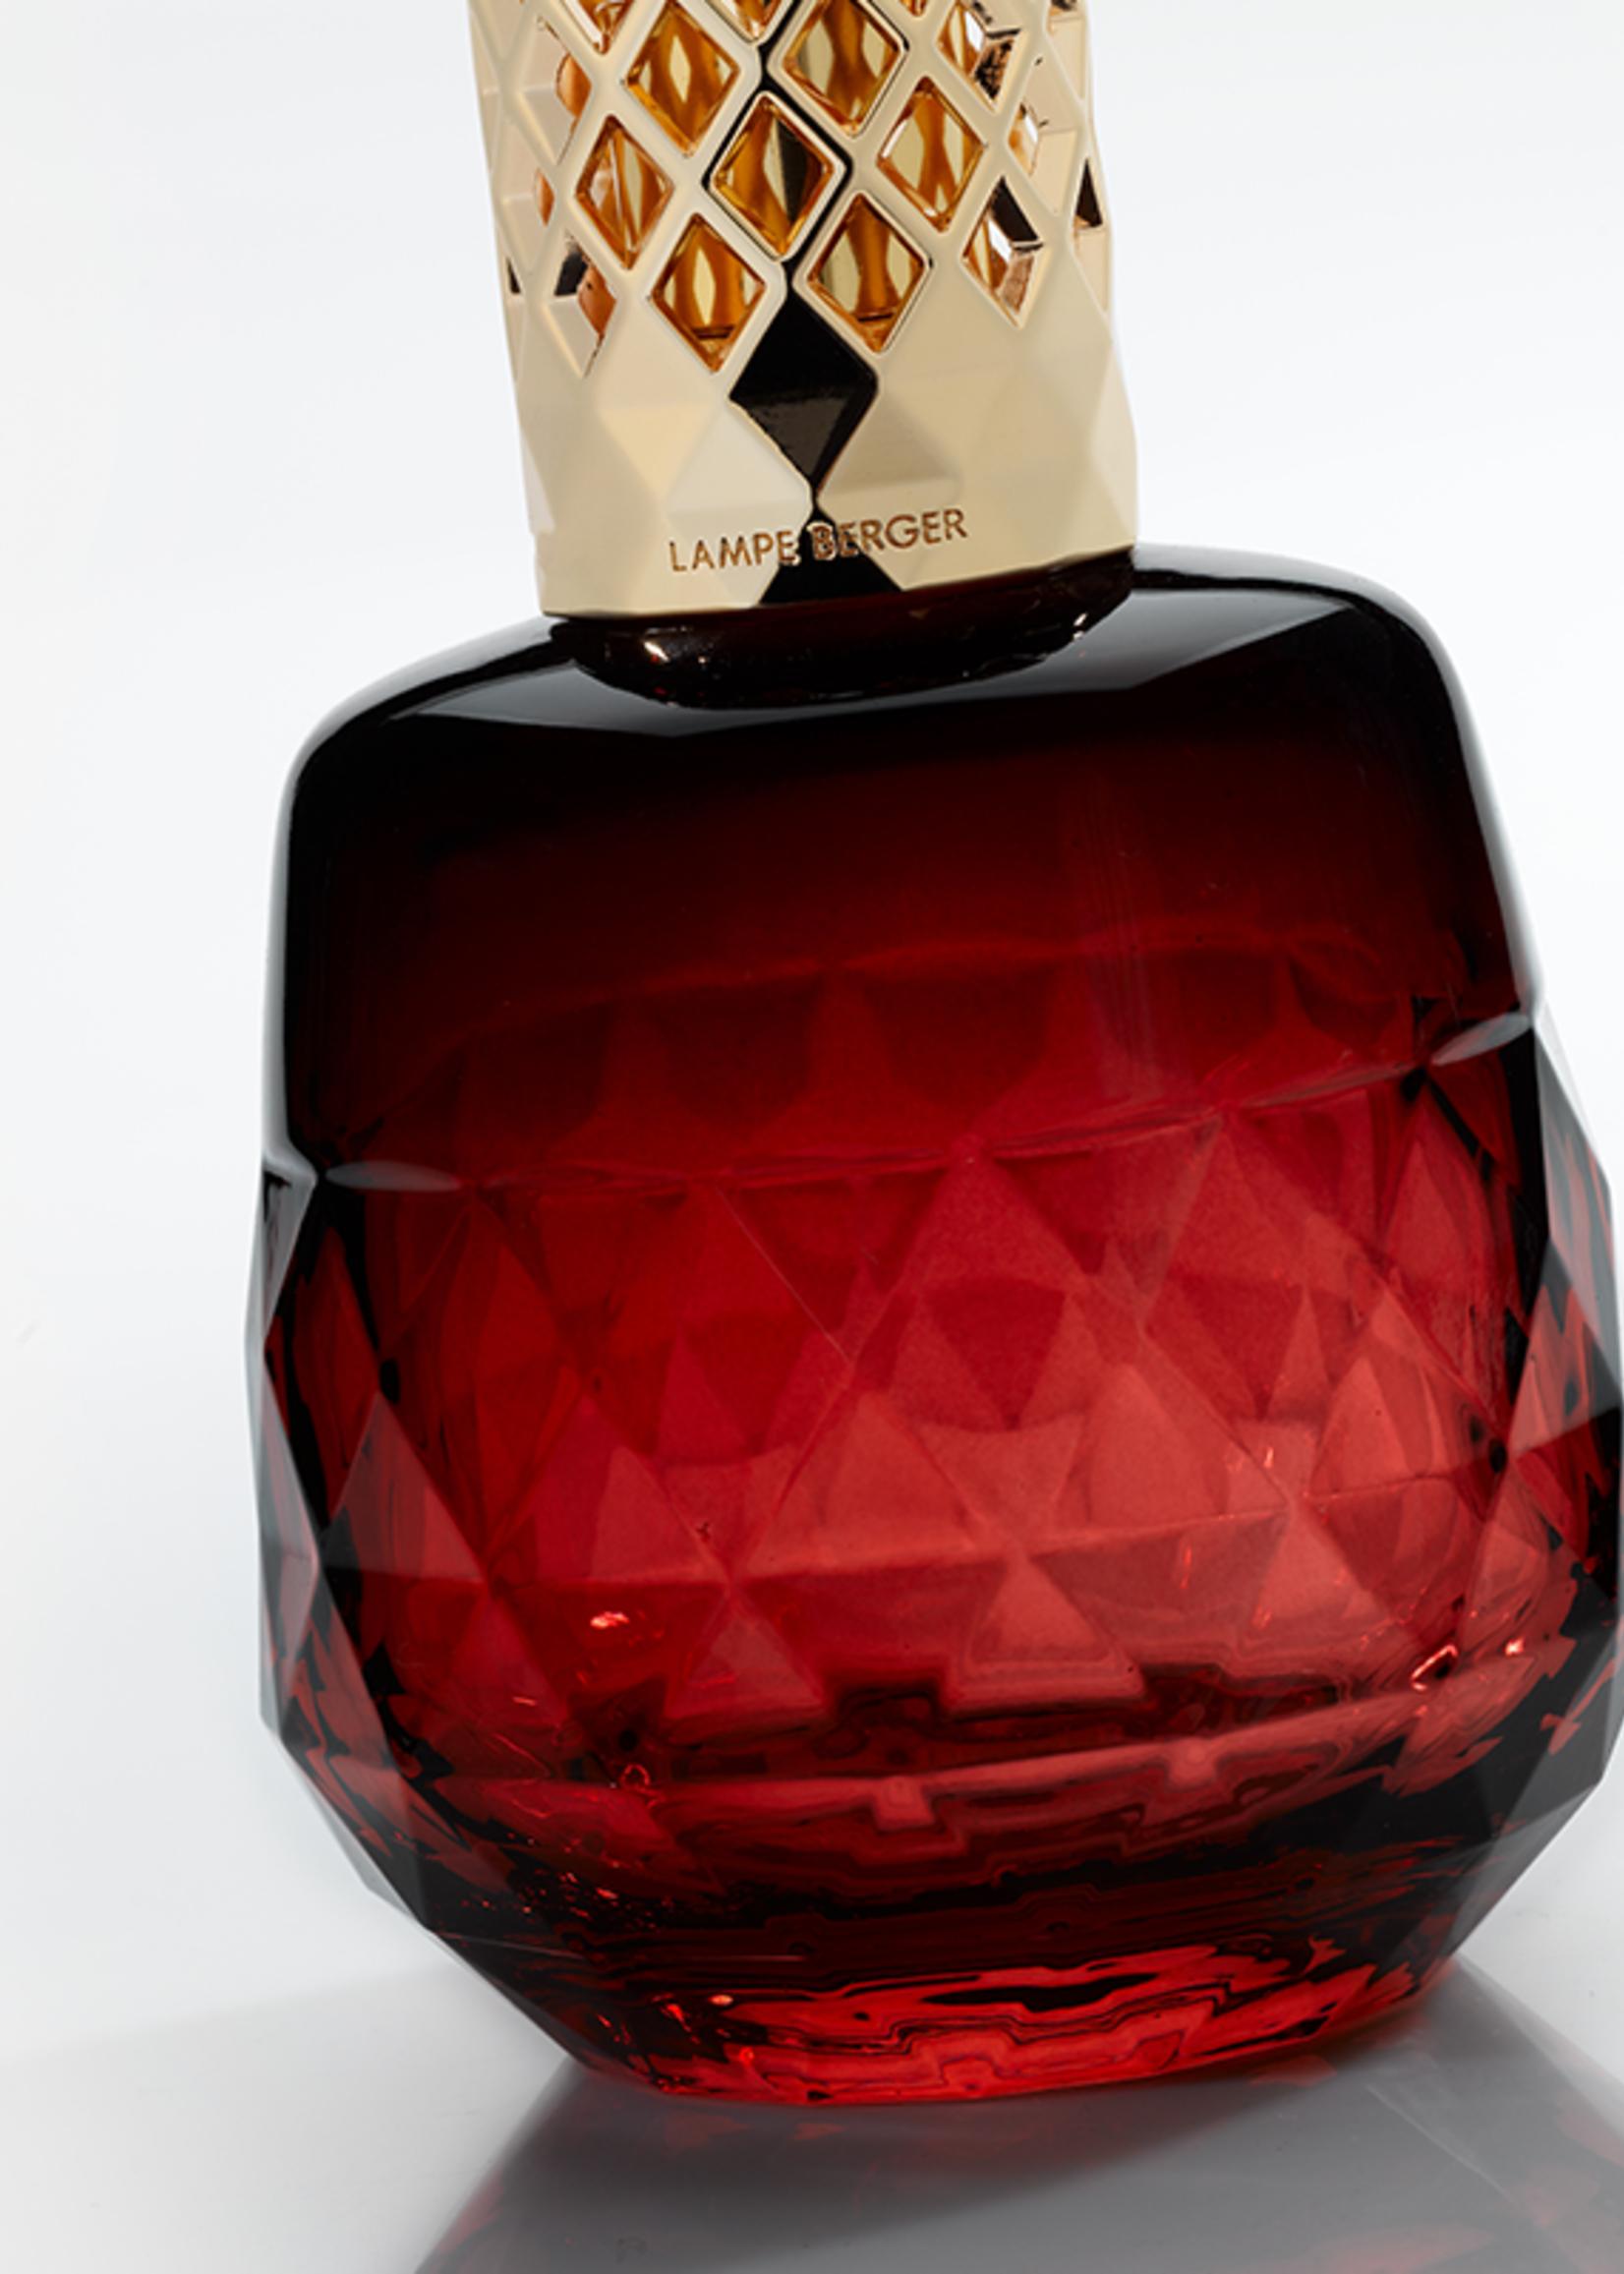 Lampe Berger Lampe Berger Clarity Bordeaux